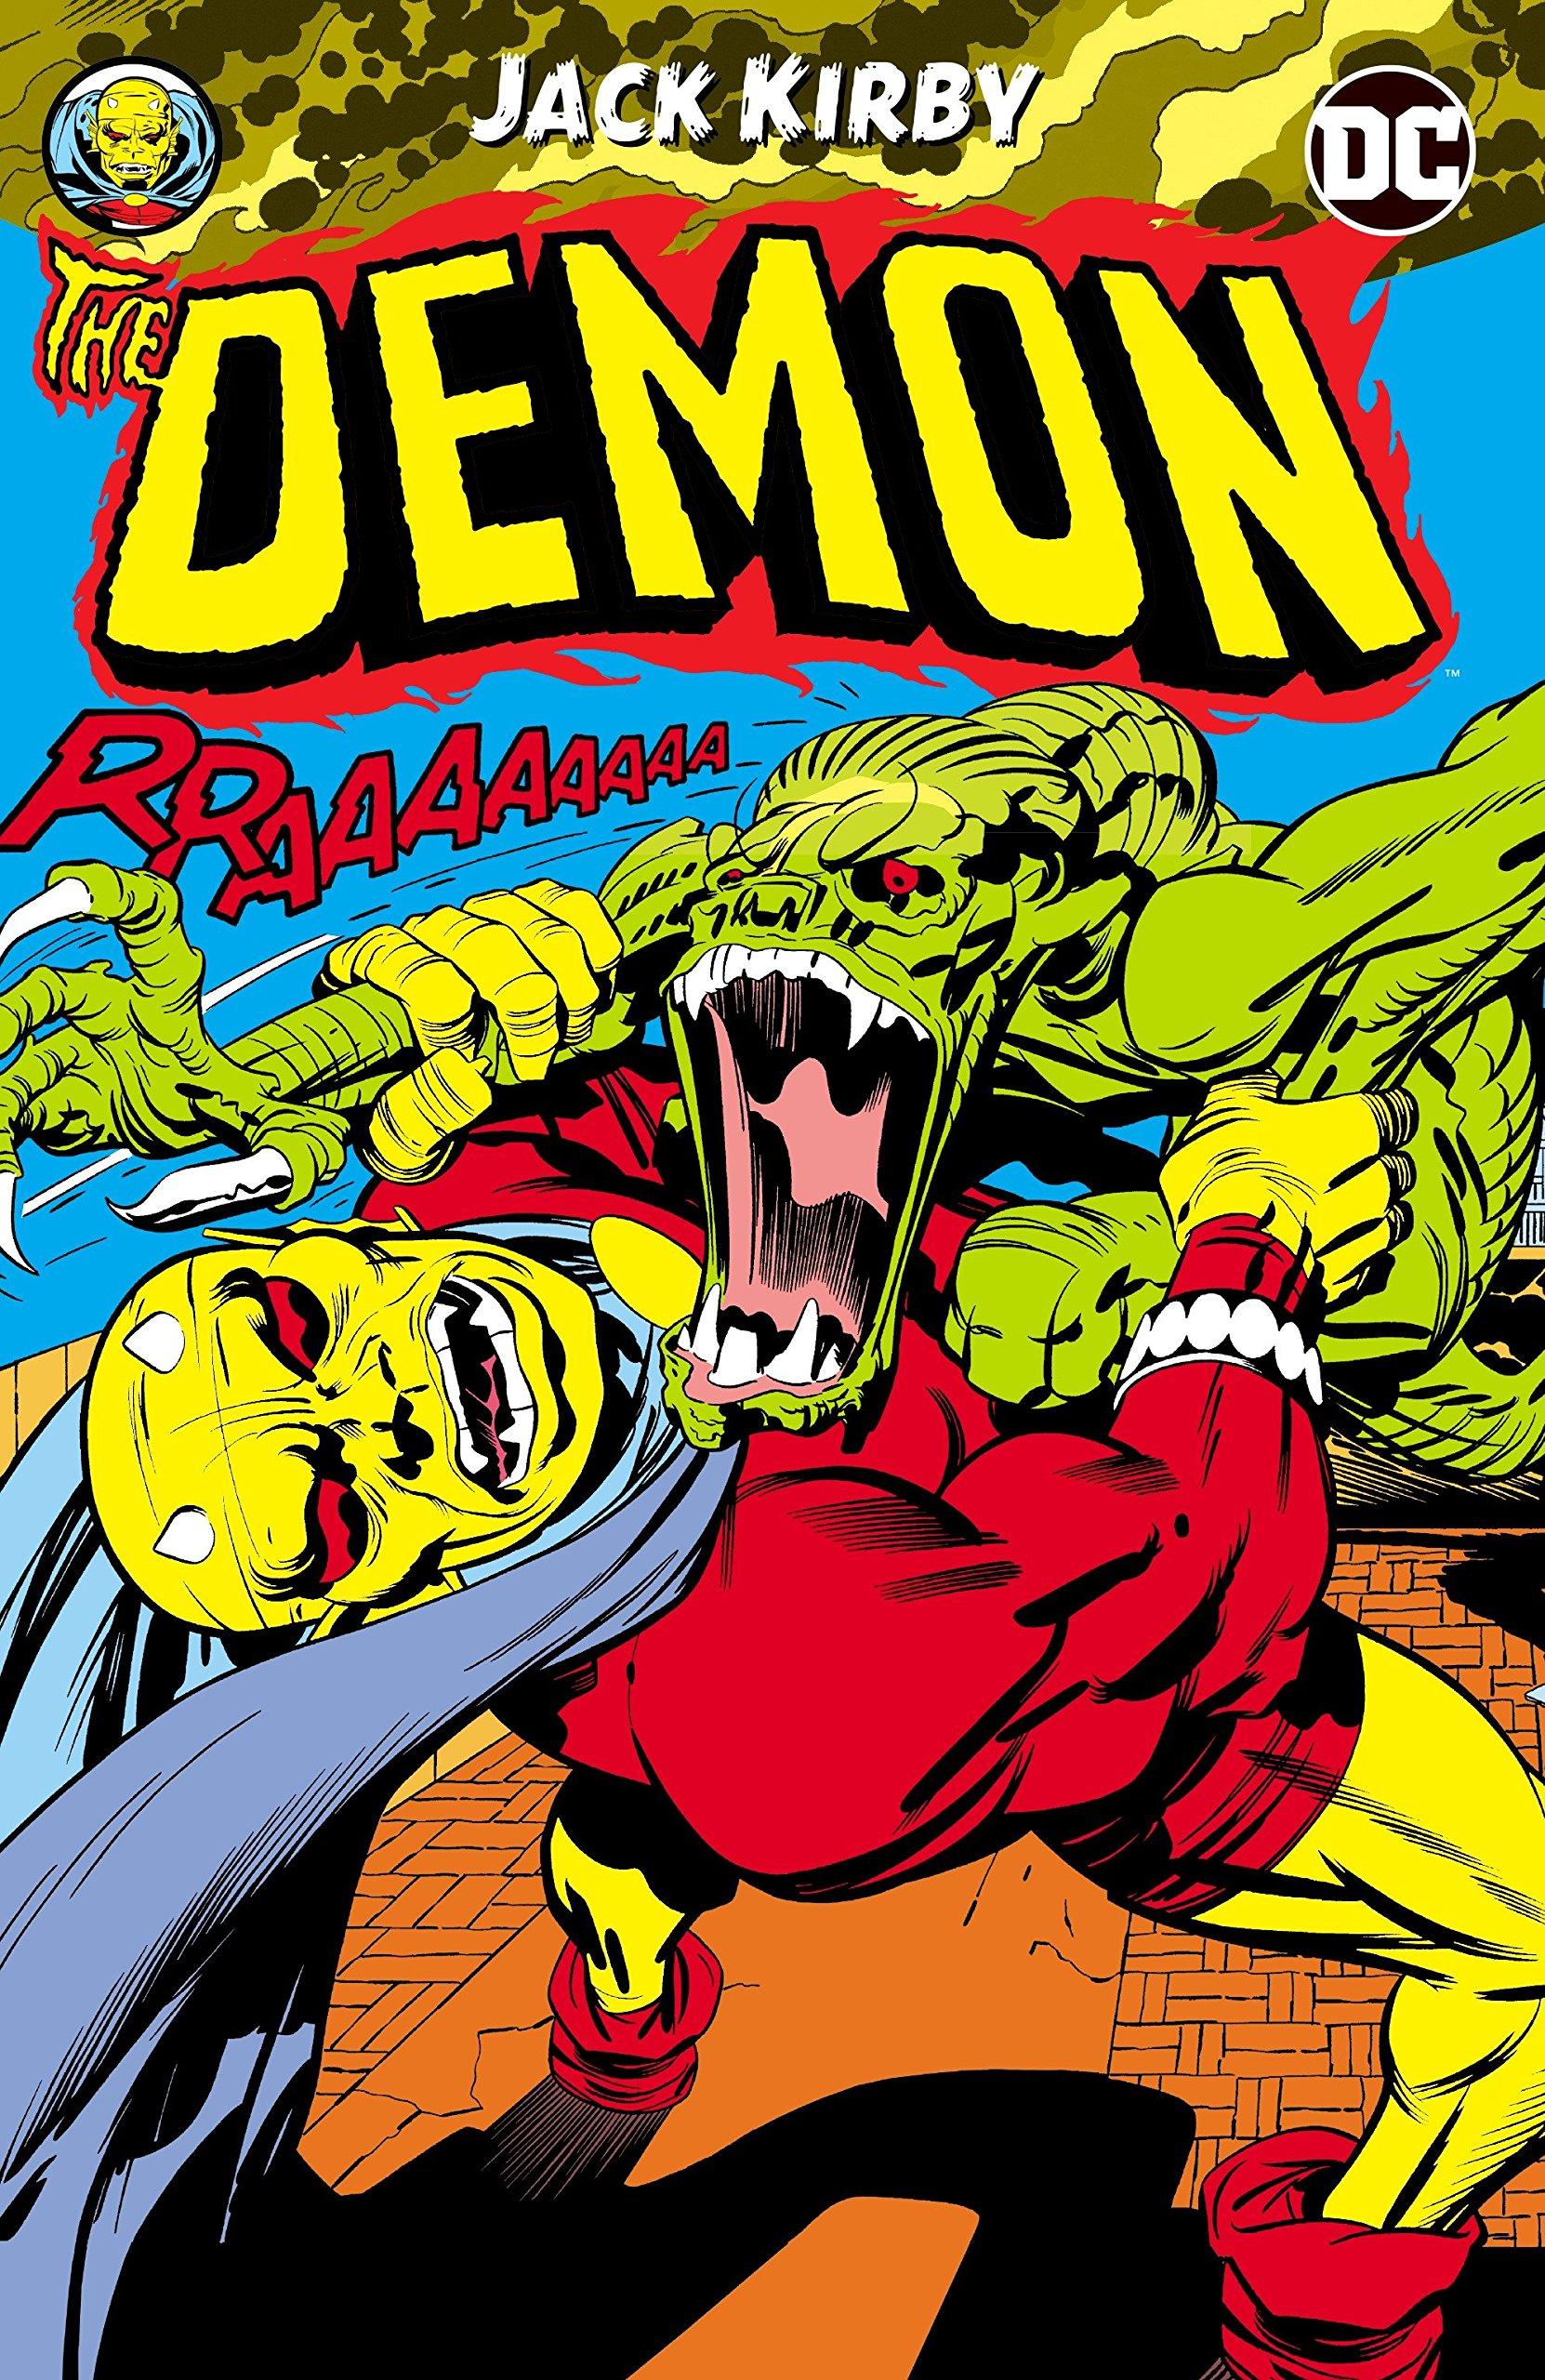 The Demon by Jack Kirby: Amazon.es: Jack Kirby: Libros en idiomas extranjeros